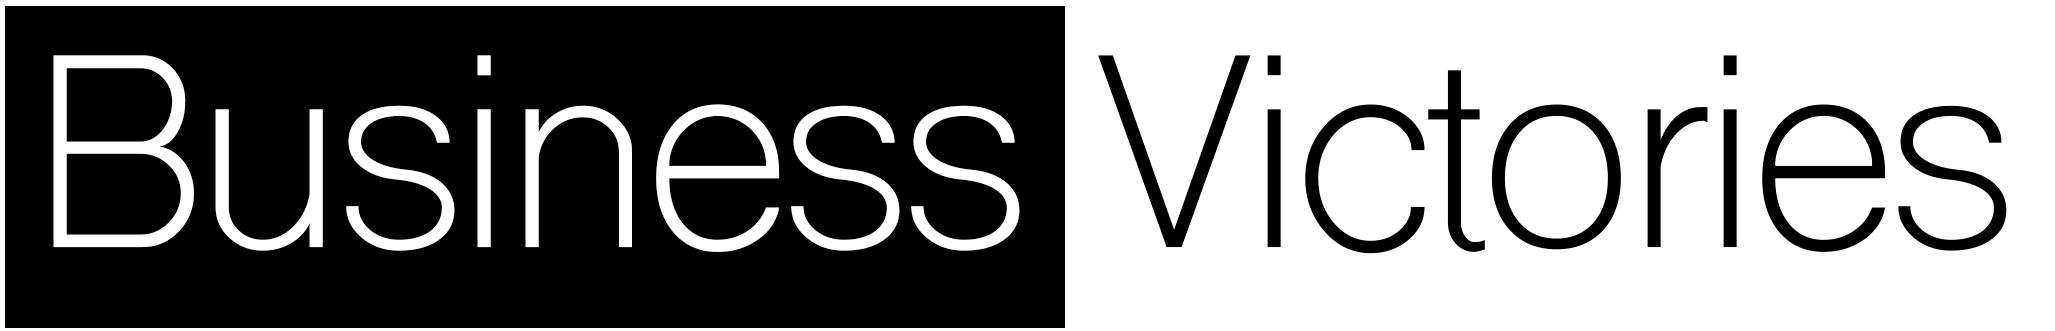 Business Victories logo 2018 Horizontal.jpg